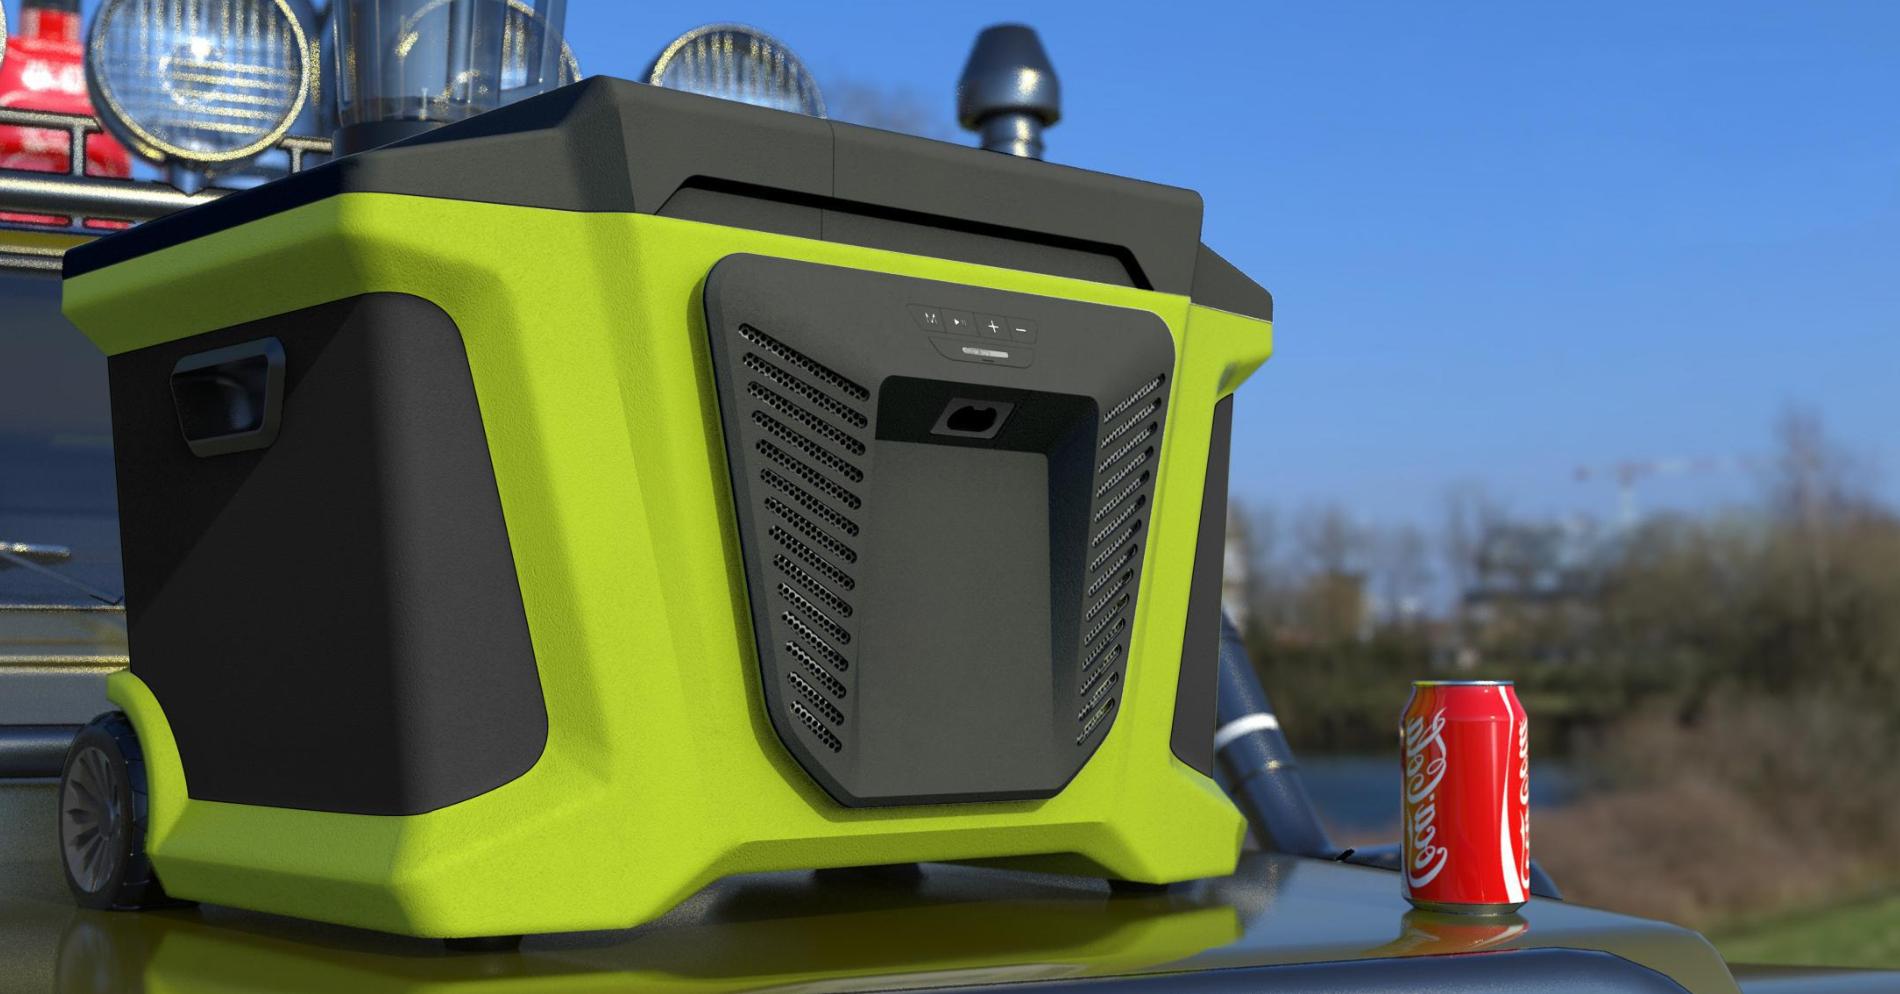 Camping-speaker-on-demand